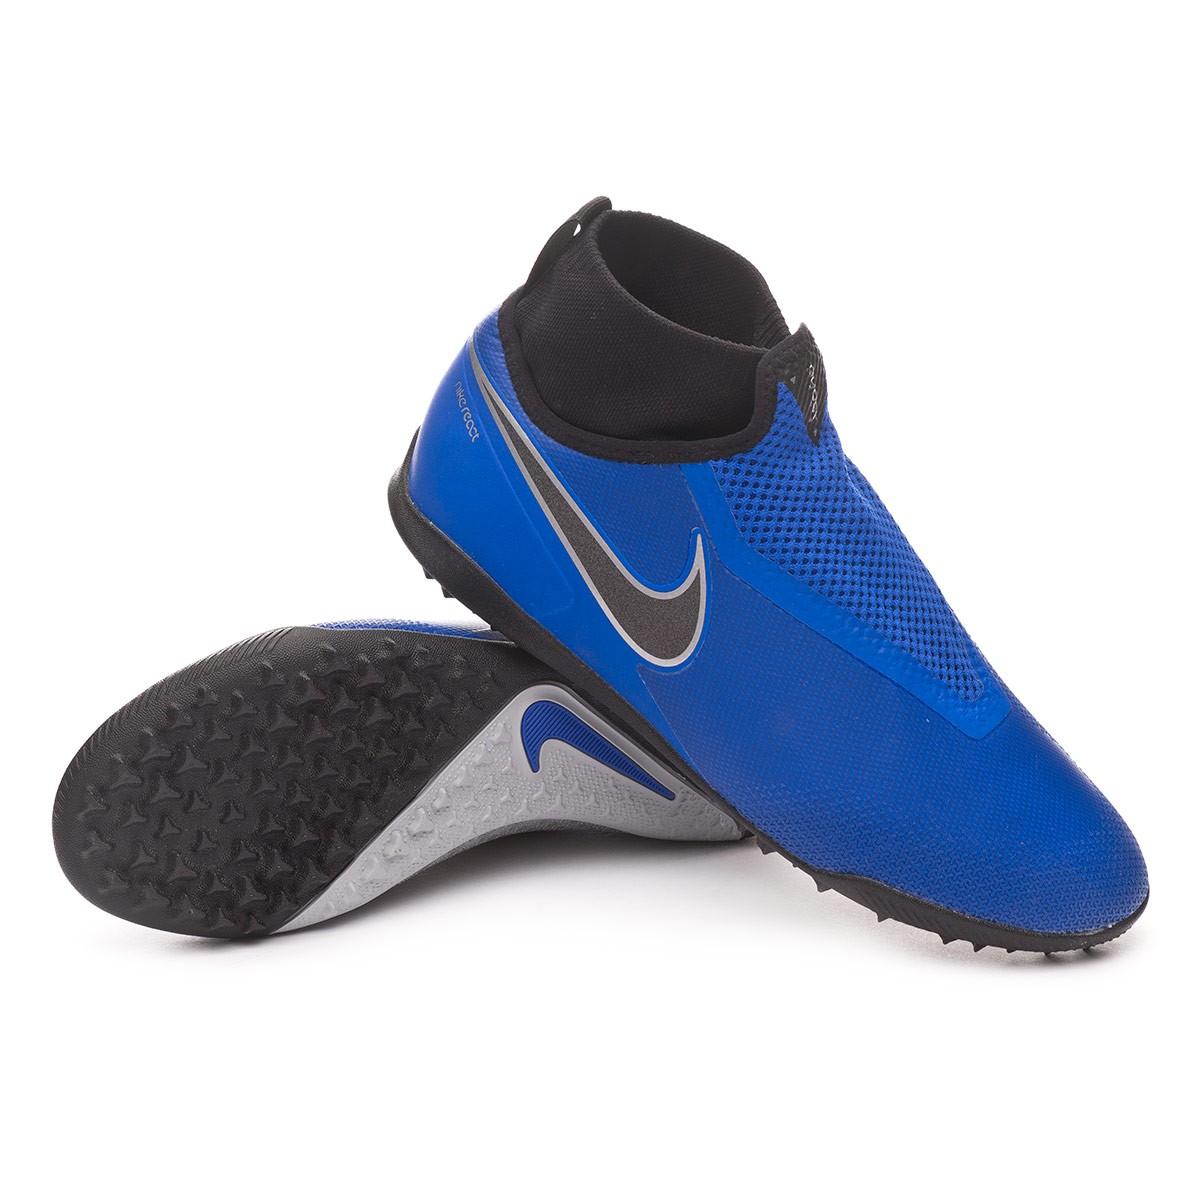 d5936d46bc1e Football Boot Nike React Phantom Vision Pro DF Turf Racer blue-Black ...